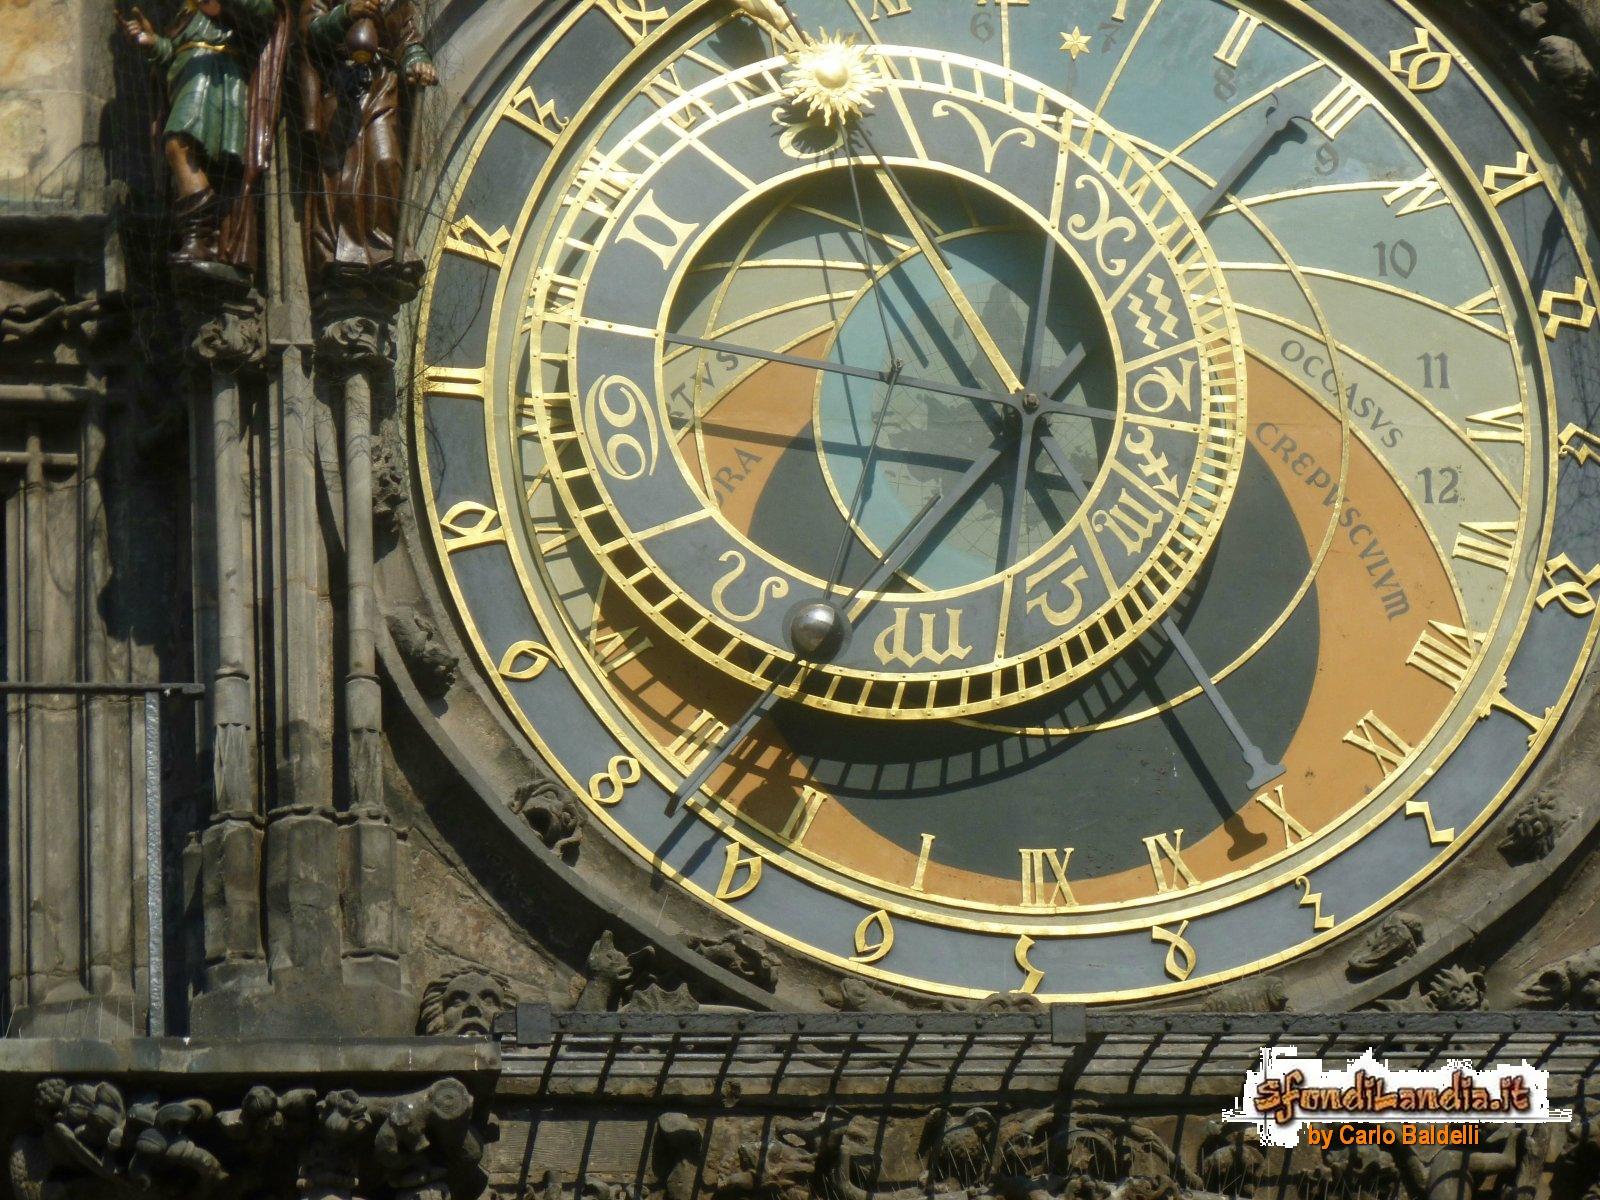 Orologio di Praga